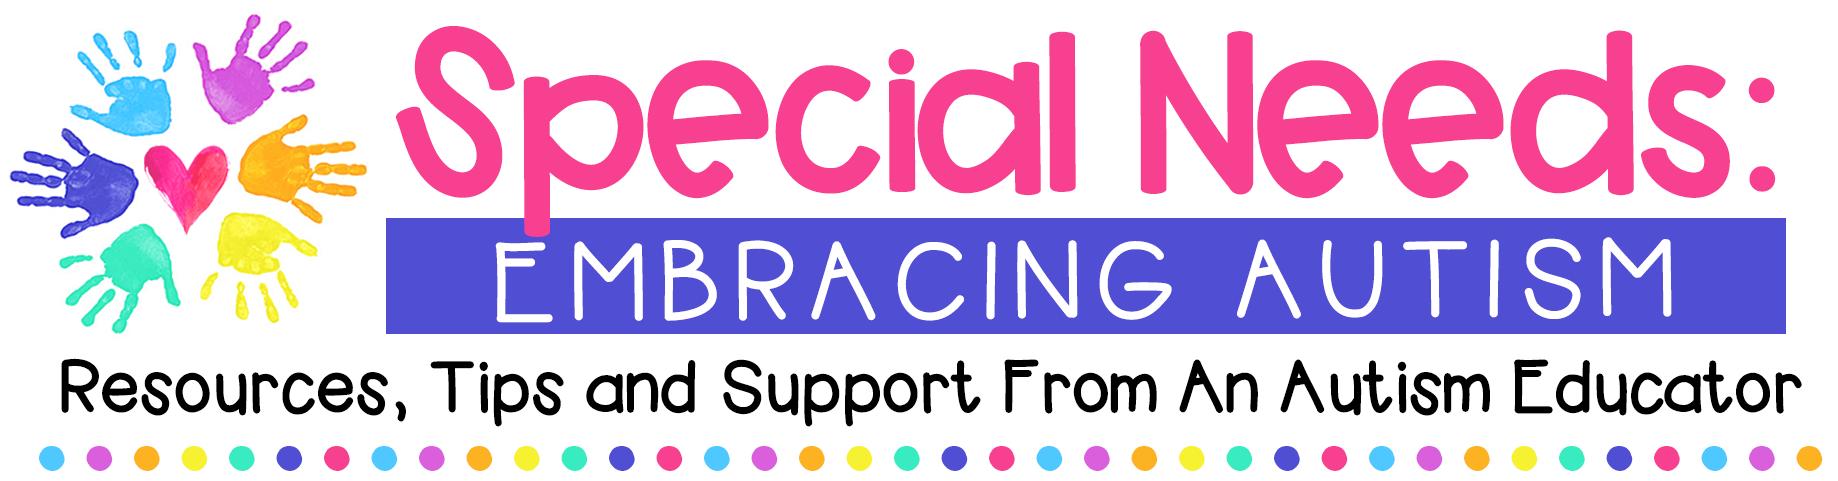 Special Needs: Embracing Autism